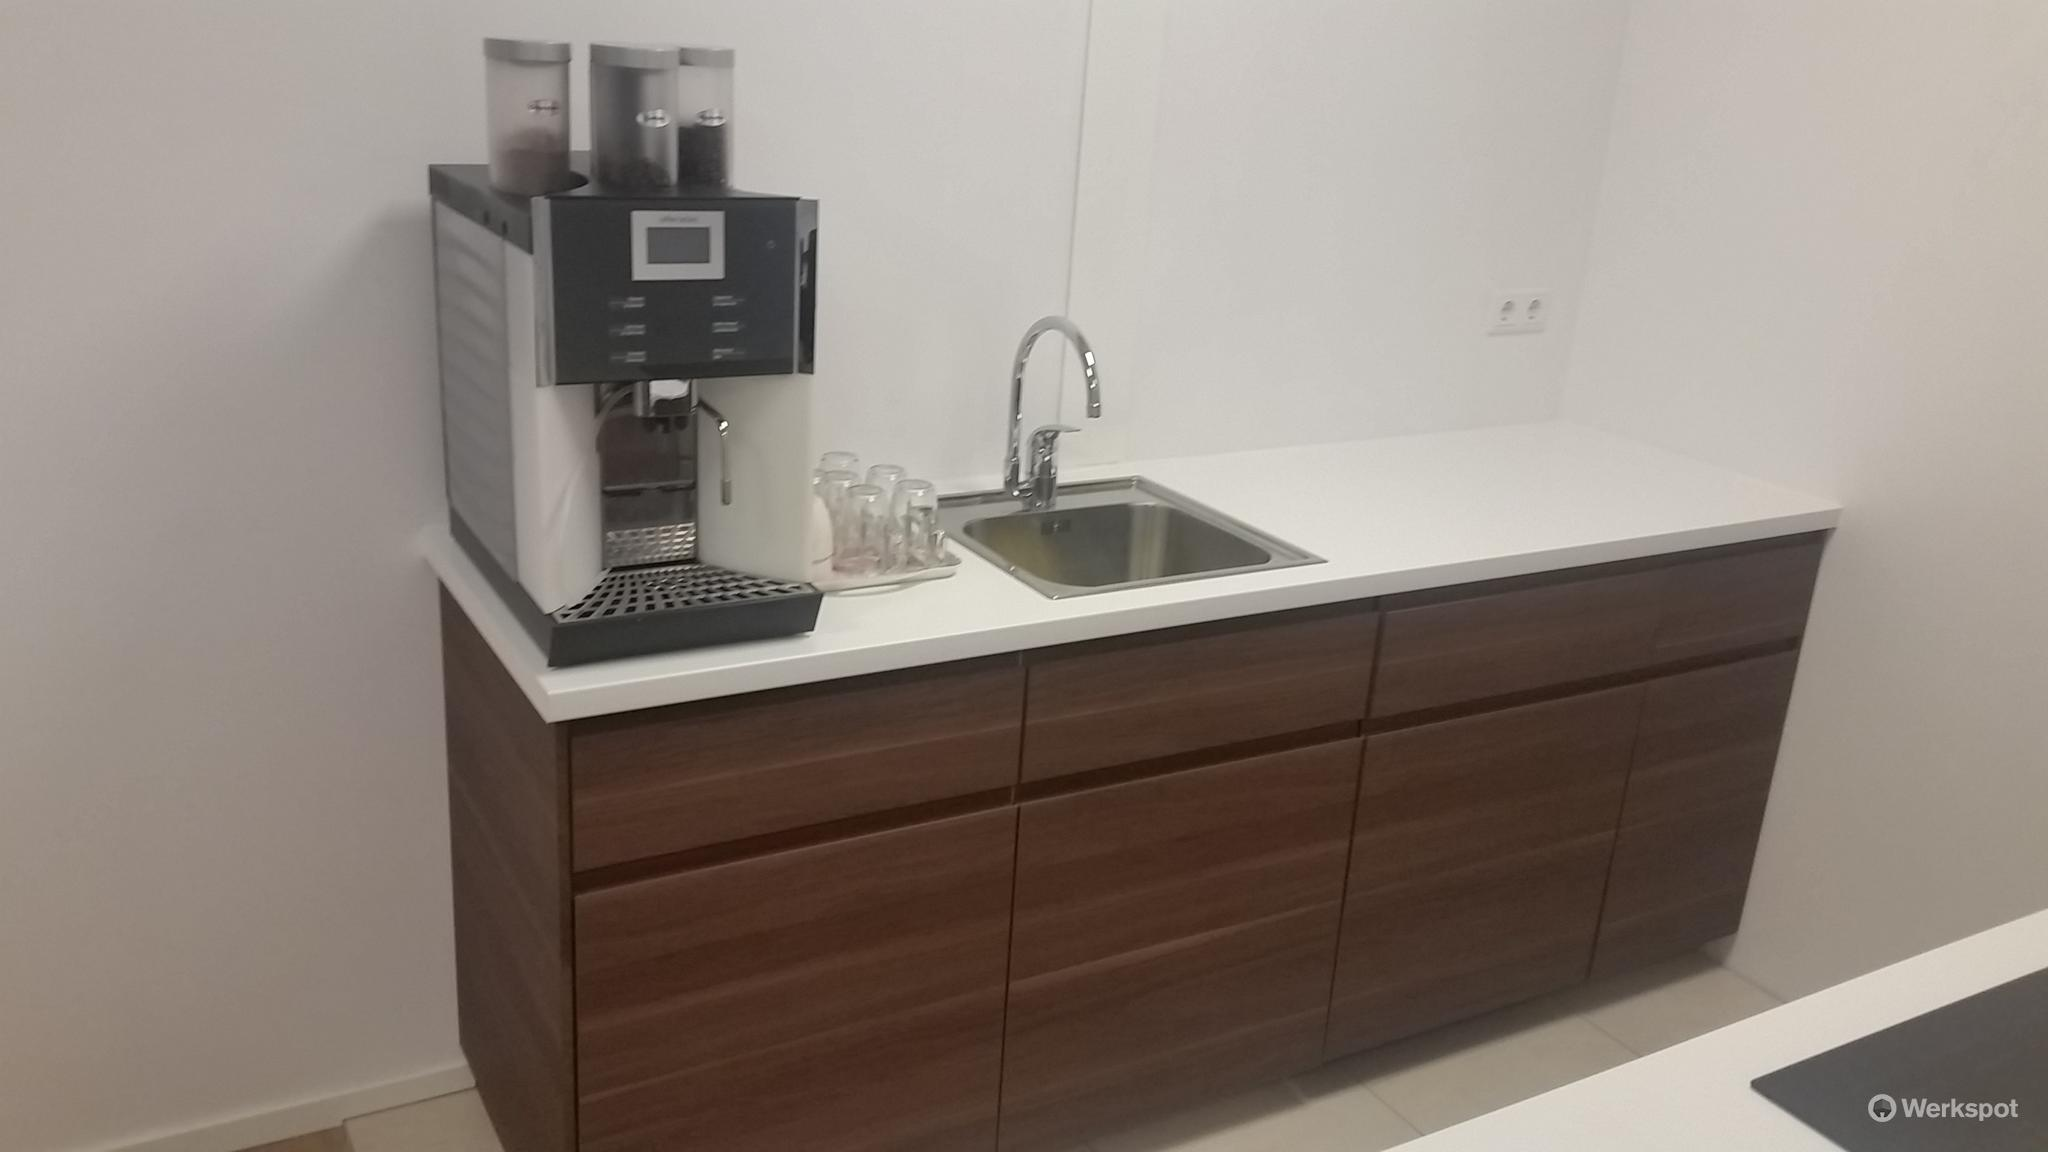 Walnoot Ikea Keuken : Ikea keuken plaatsen type voxtorp walnoten werkspot